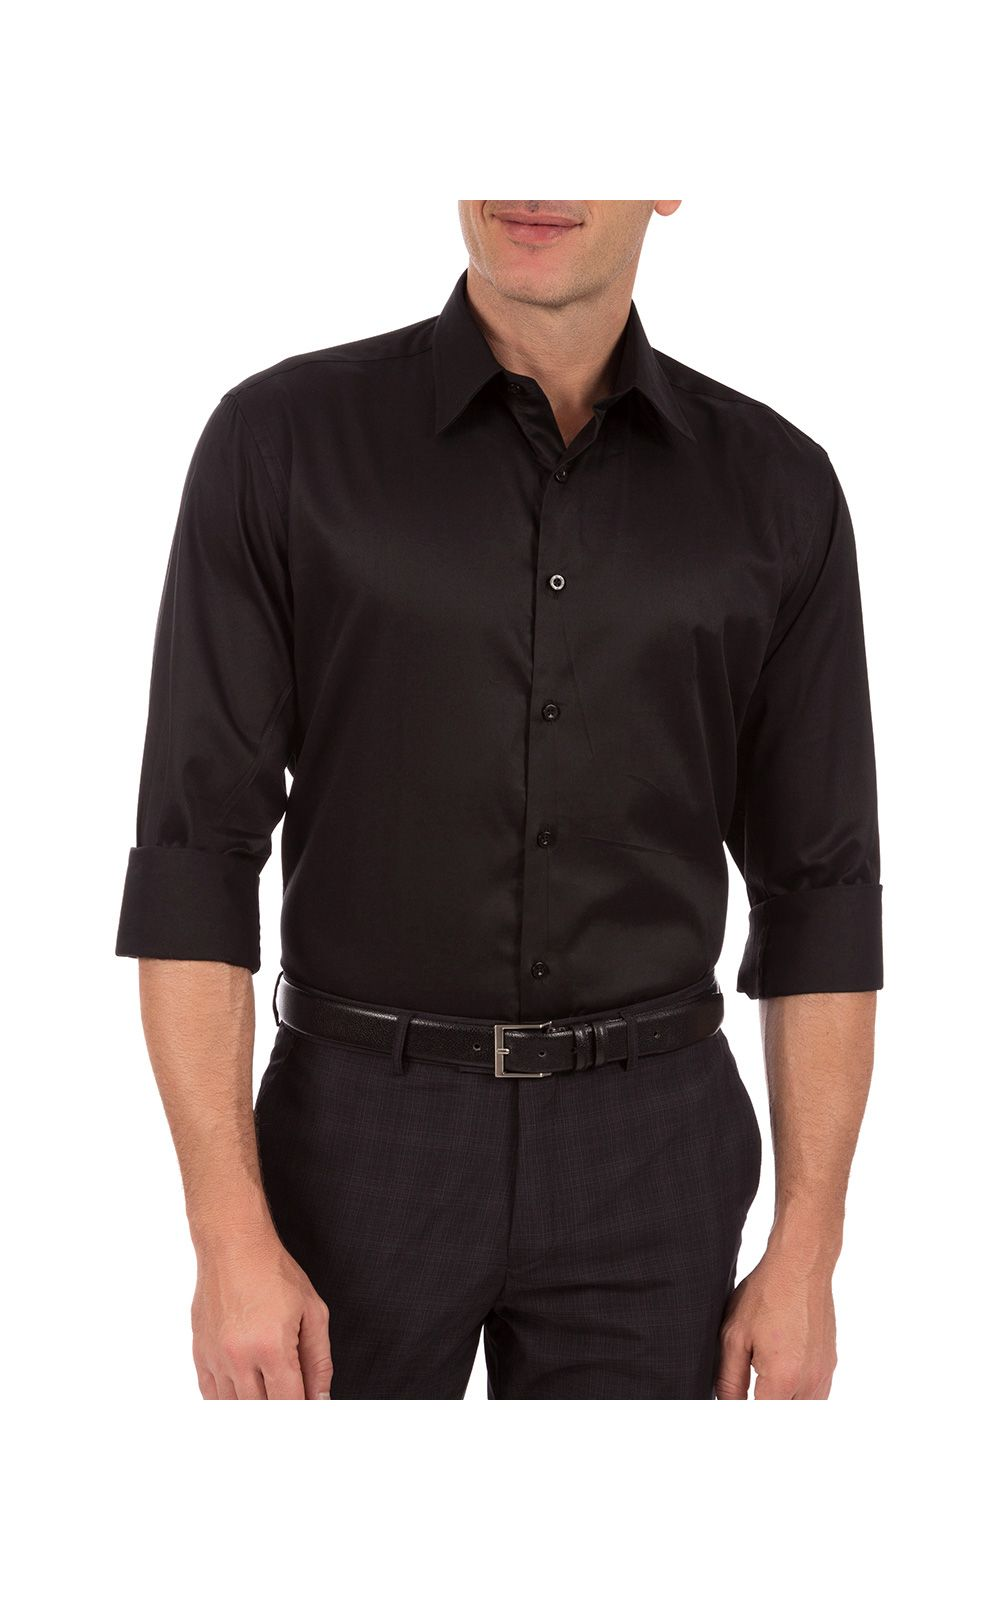 Foto 1 - Camisa Social Masculina Preta Lisa